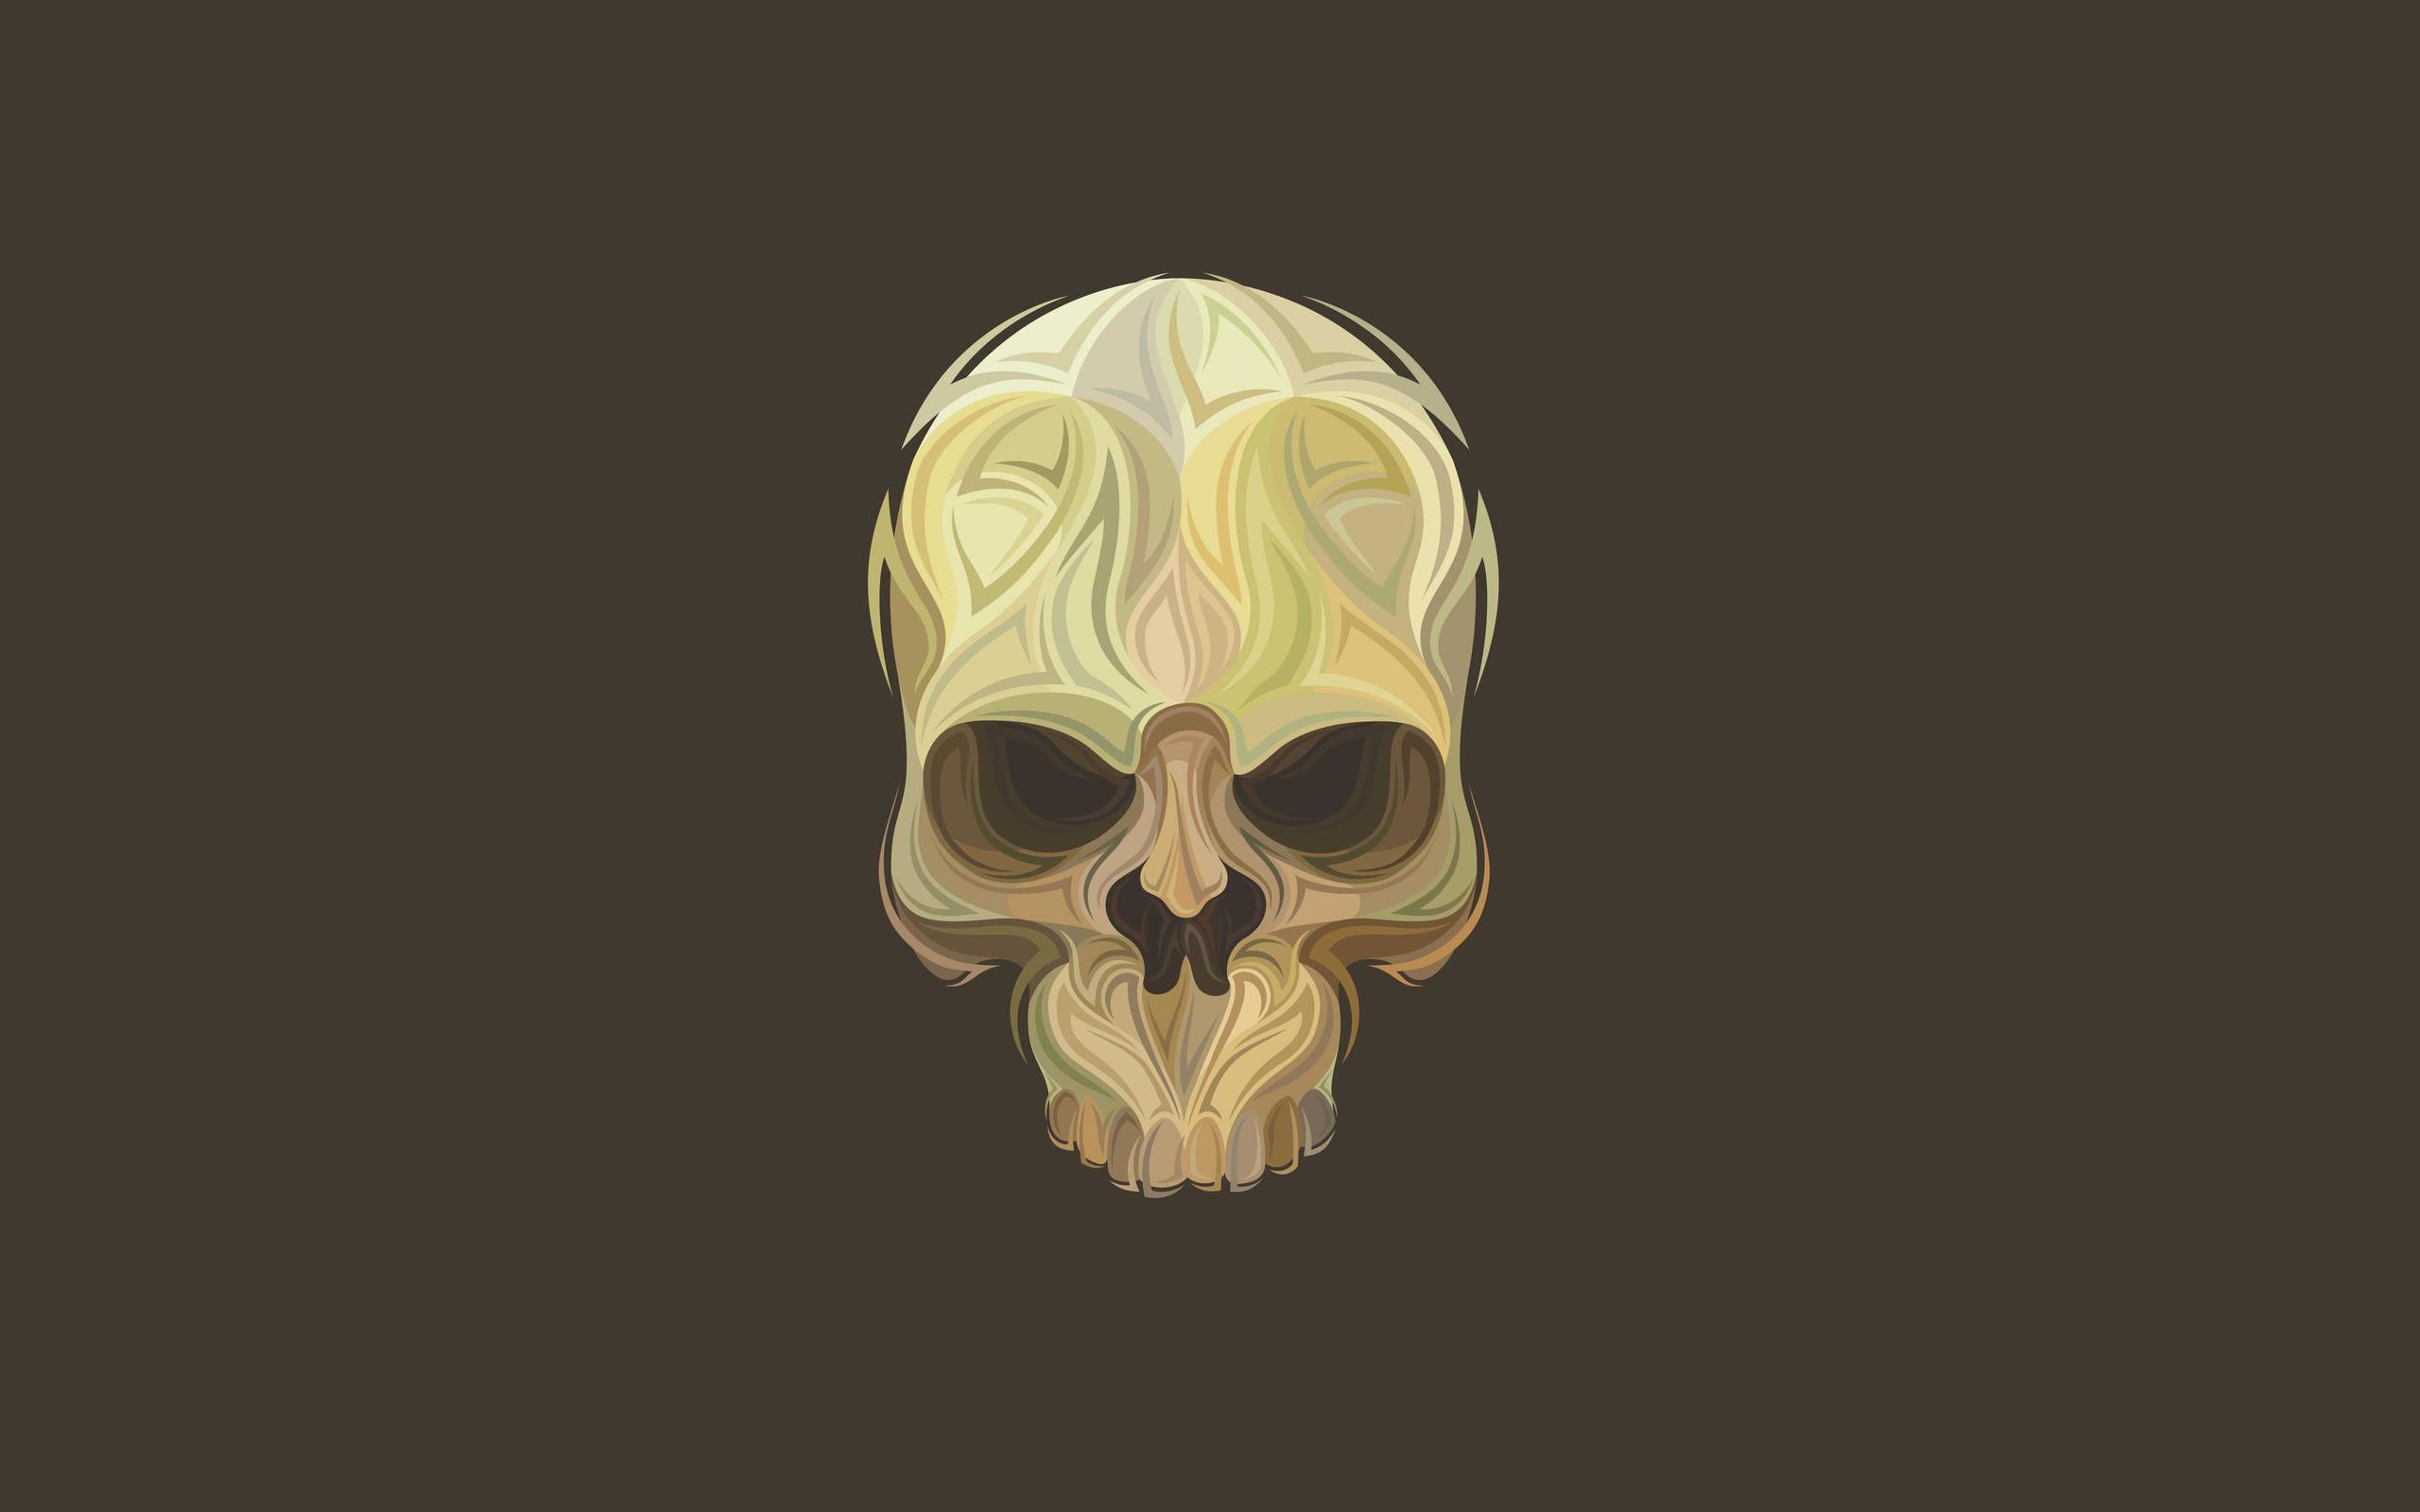 Skull Head Wallpaper - WallpaperSafari